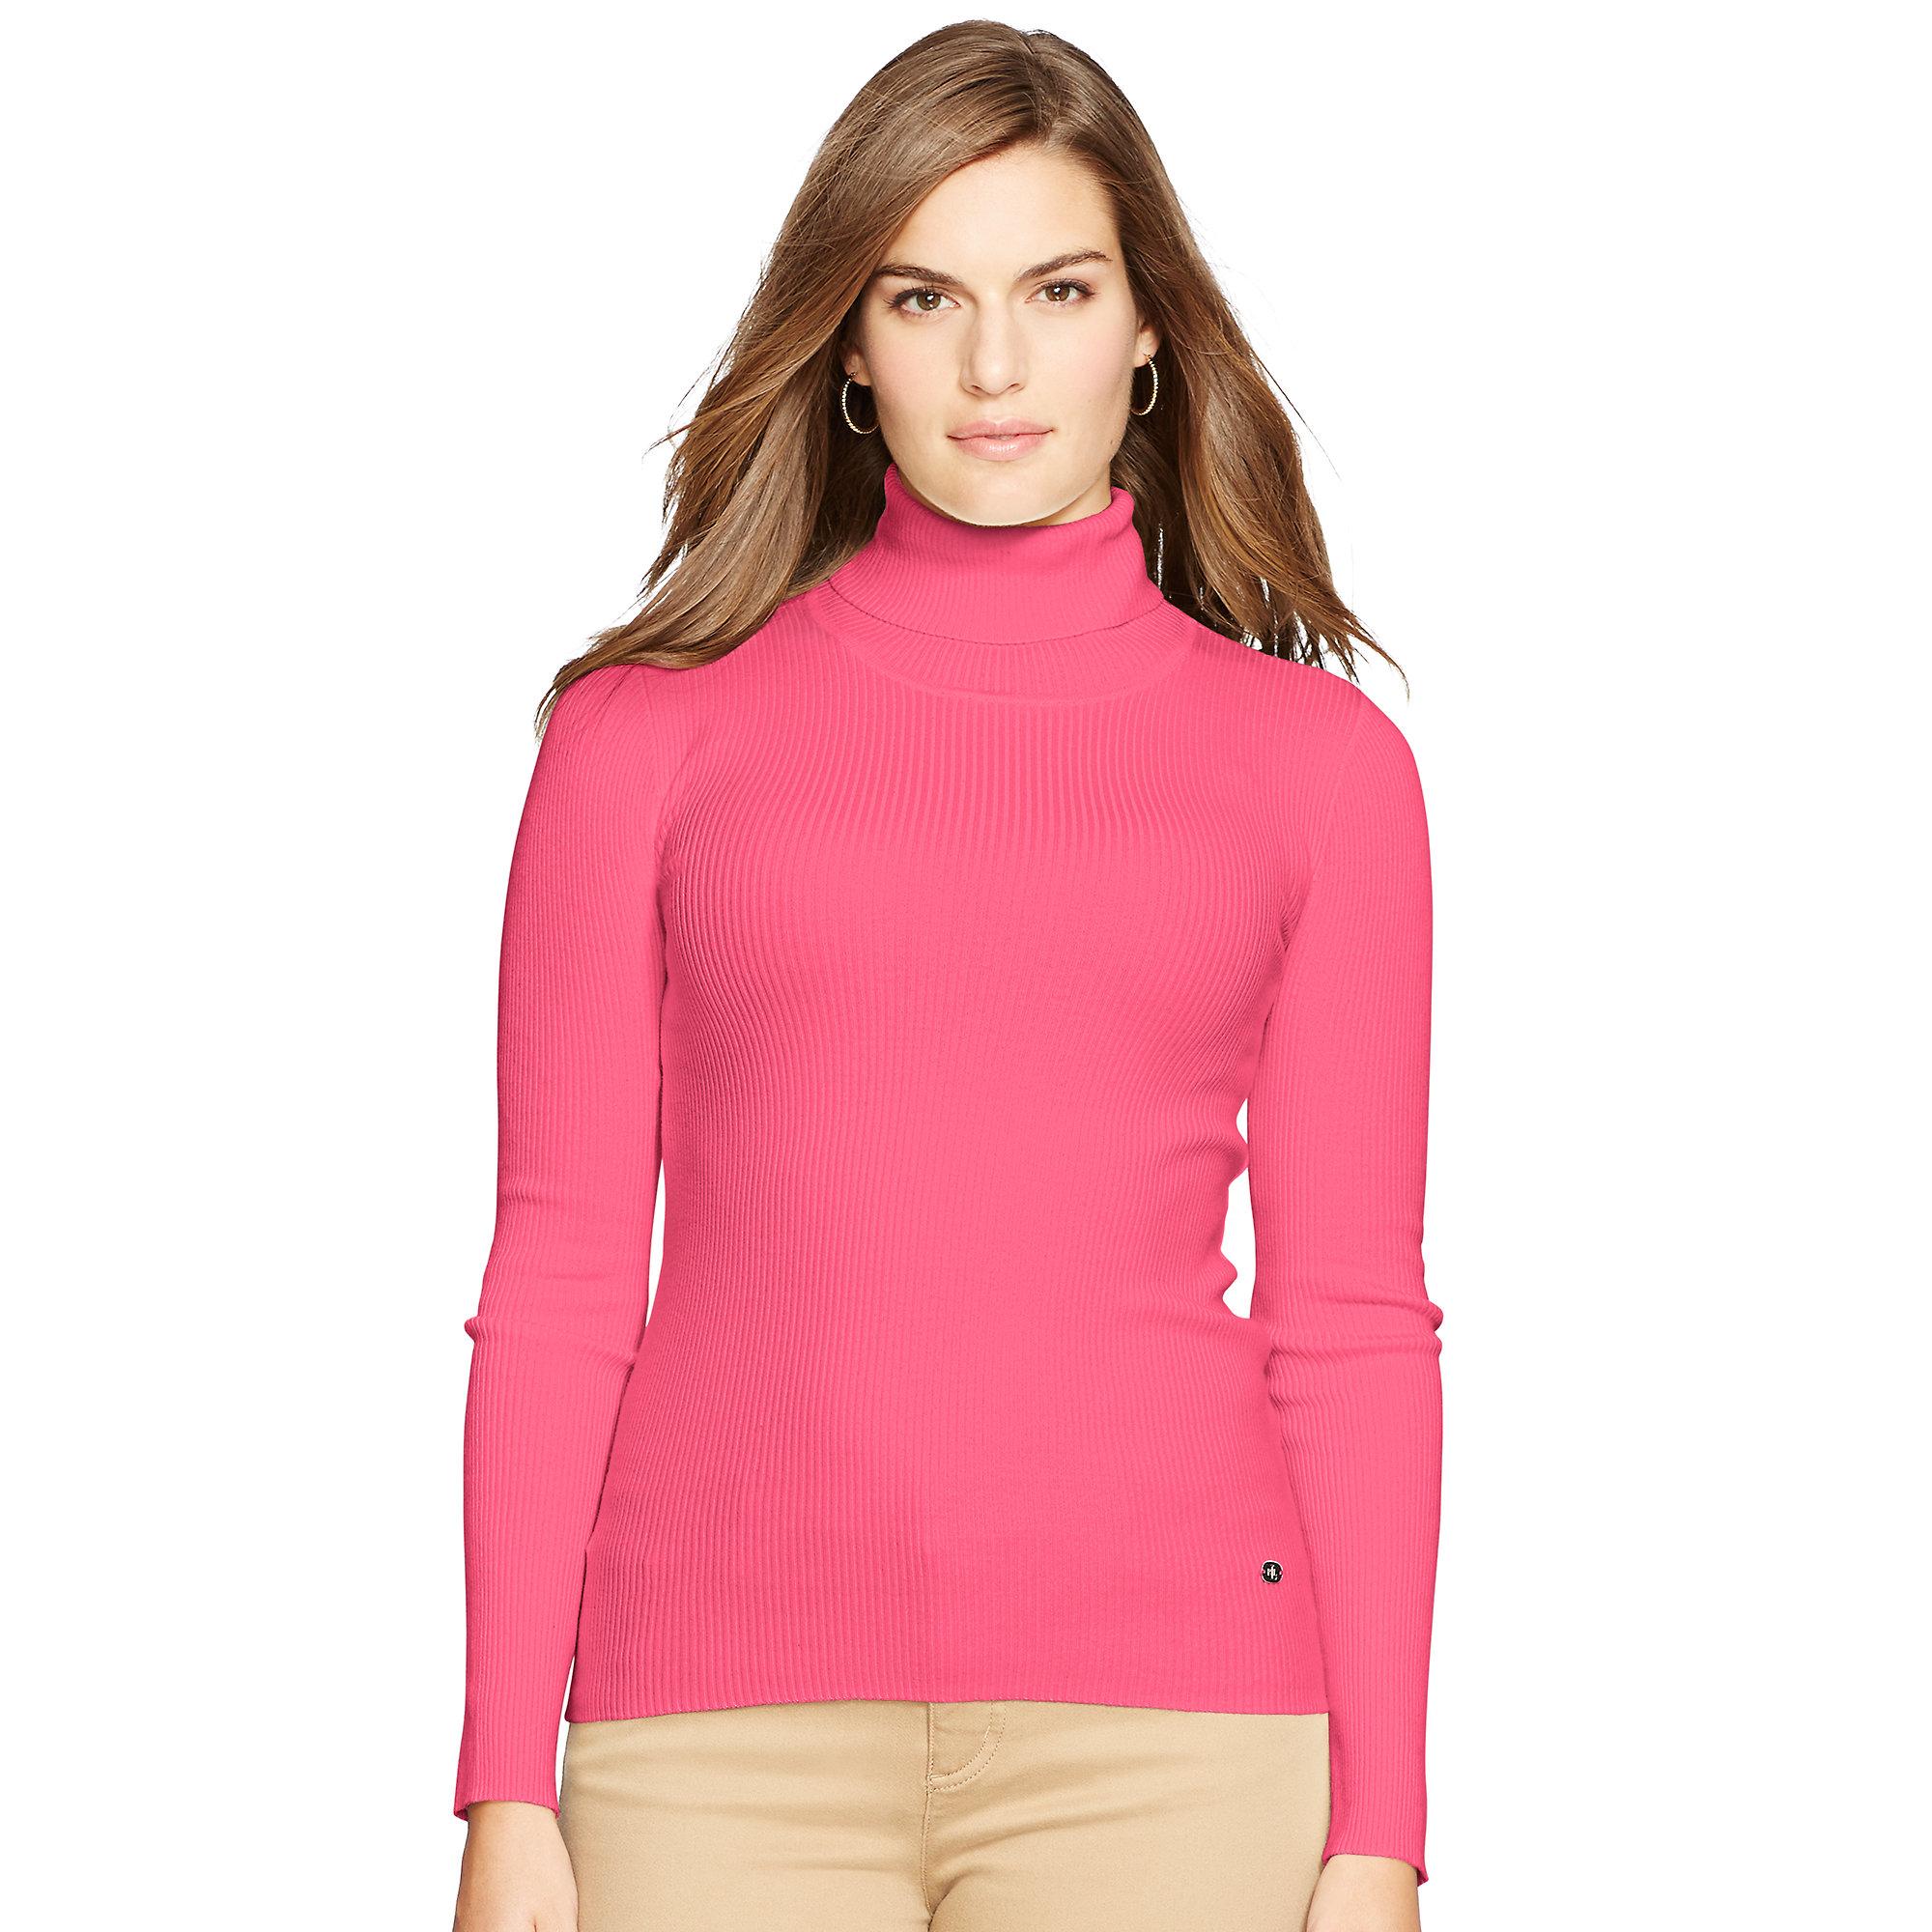 Ralph lauren Ribbed Turtleneck Sweater in Pink | Lyst